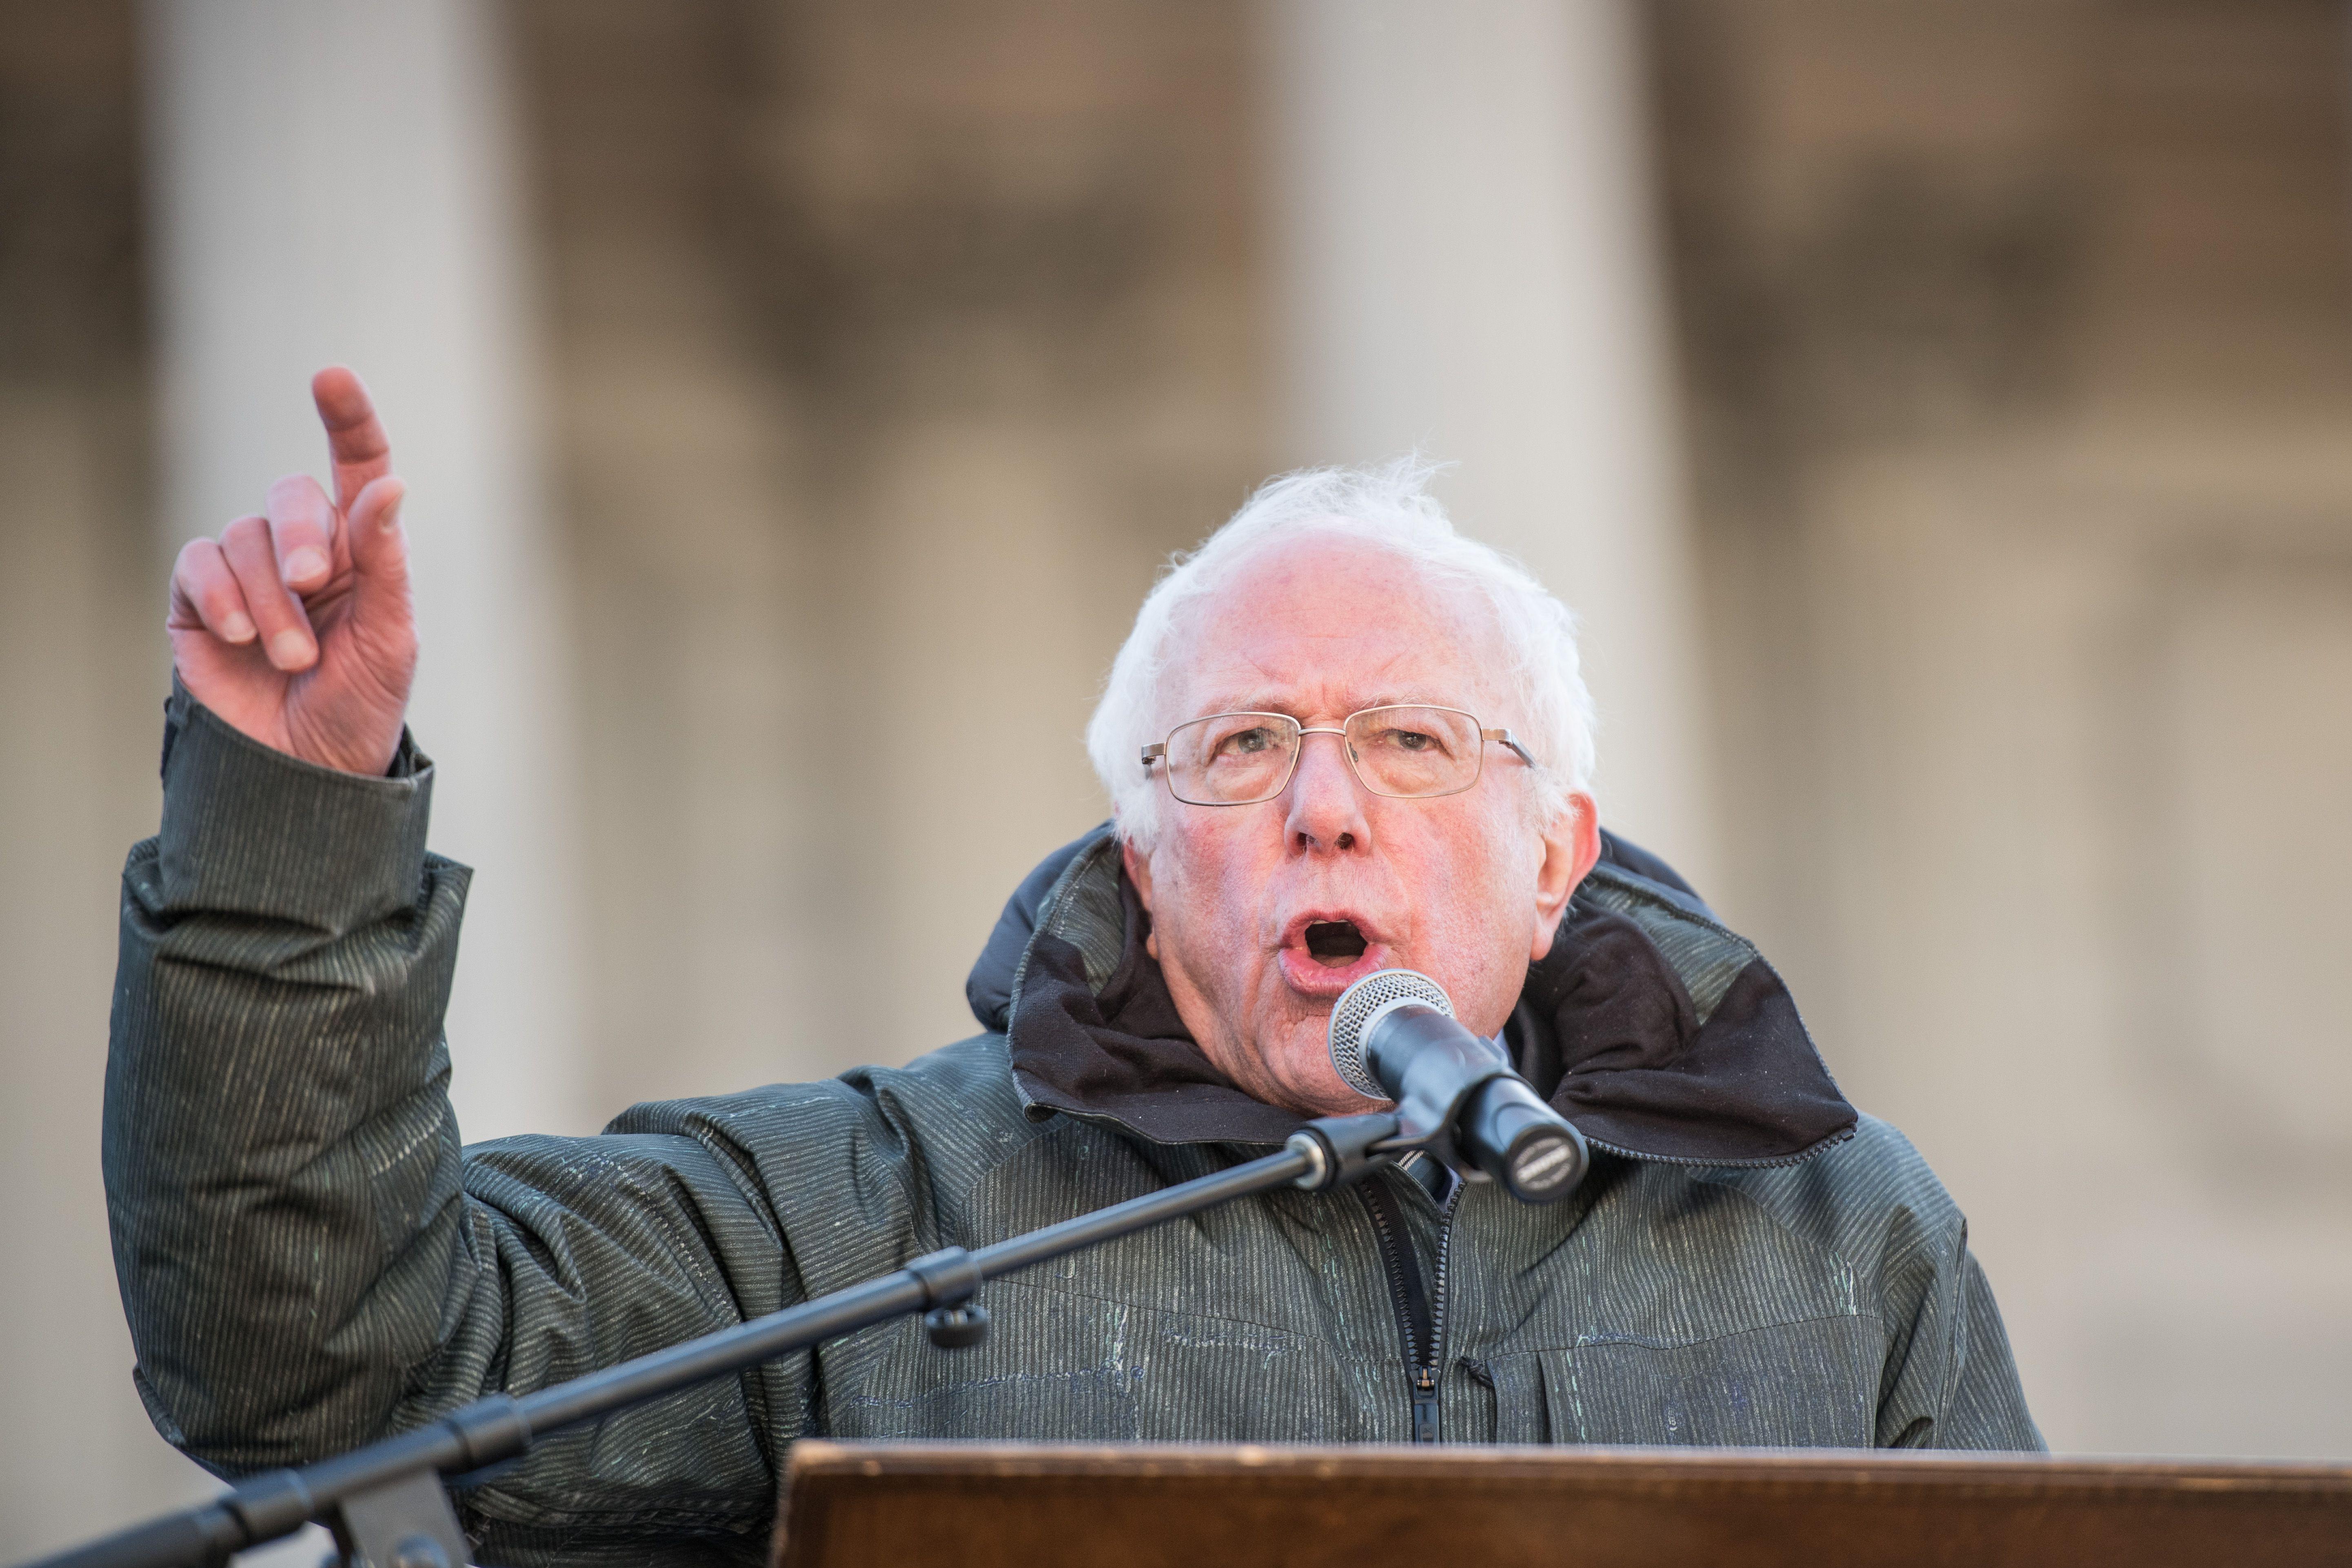 Bernie Sanders on the issues, in under 500 words